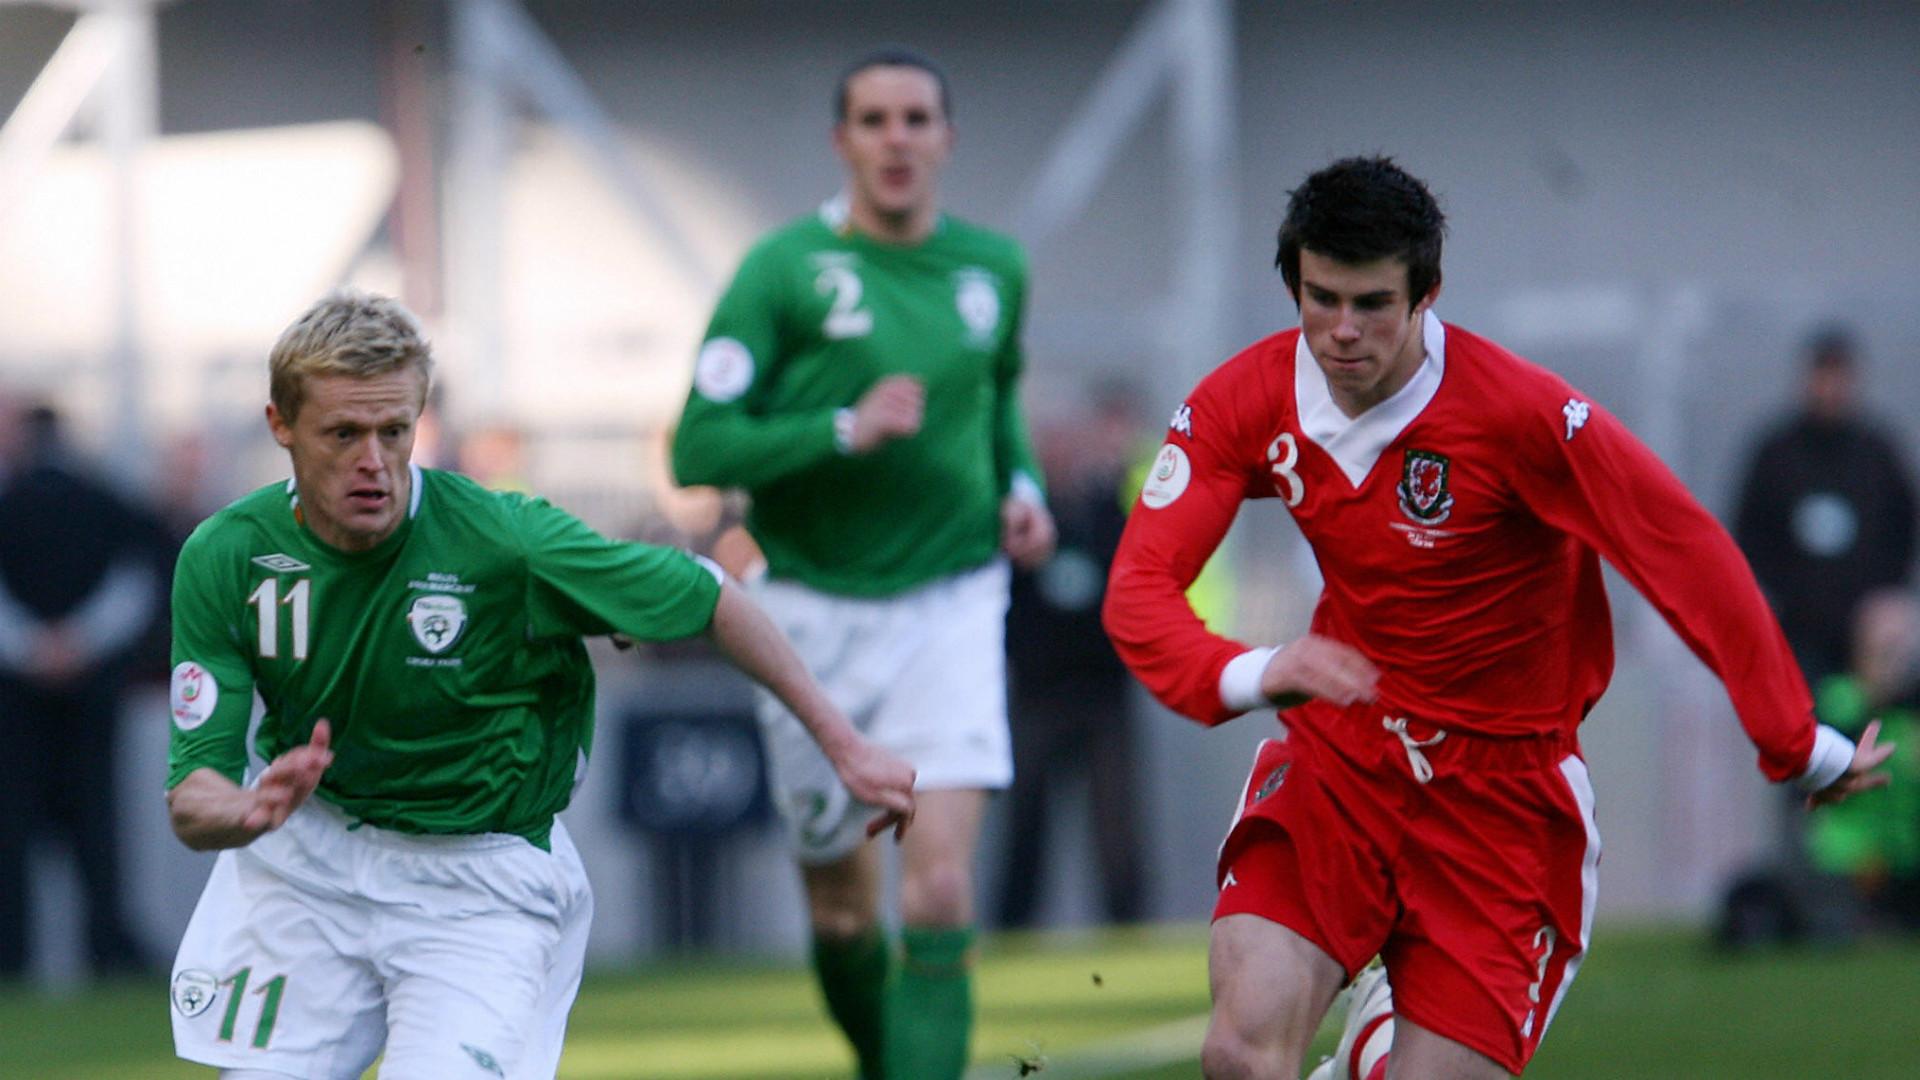 Damien Duff Gareth Bale Republic of Ireland Wales 24032007